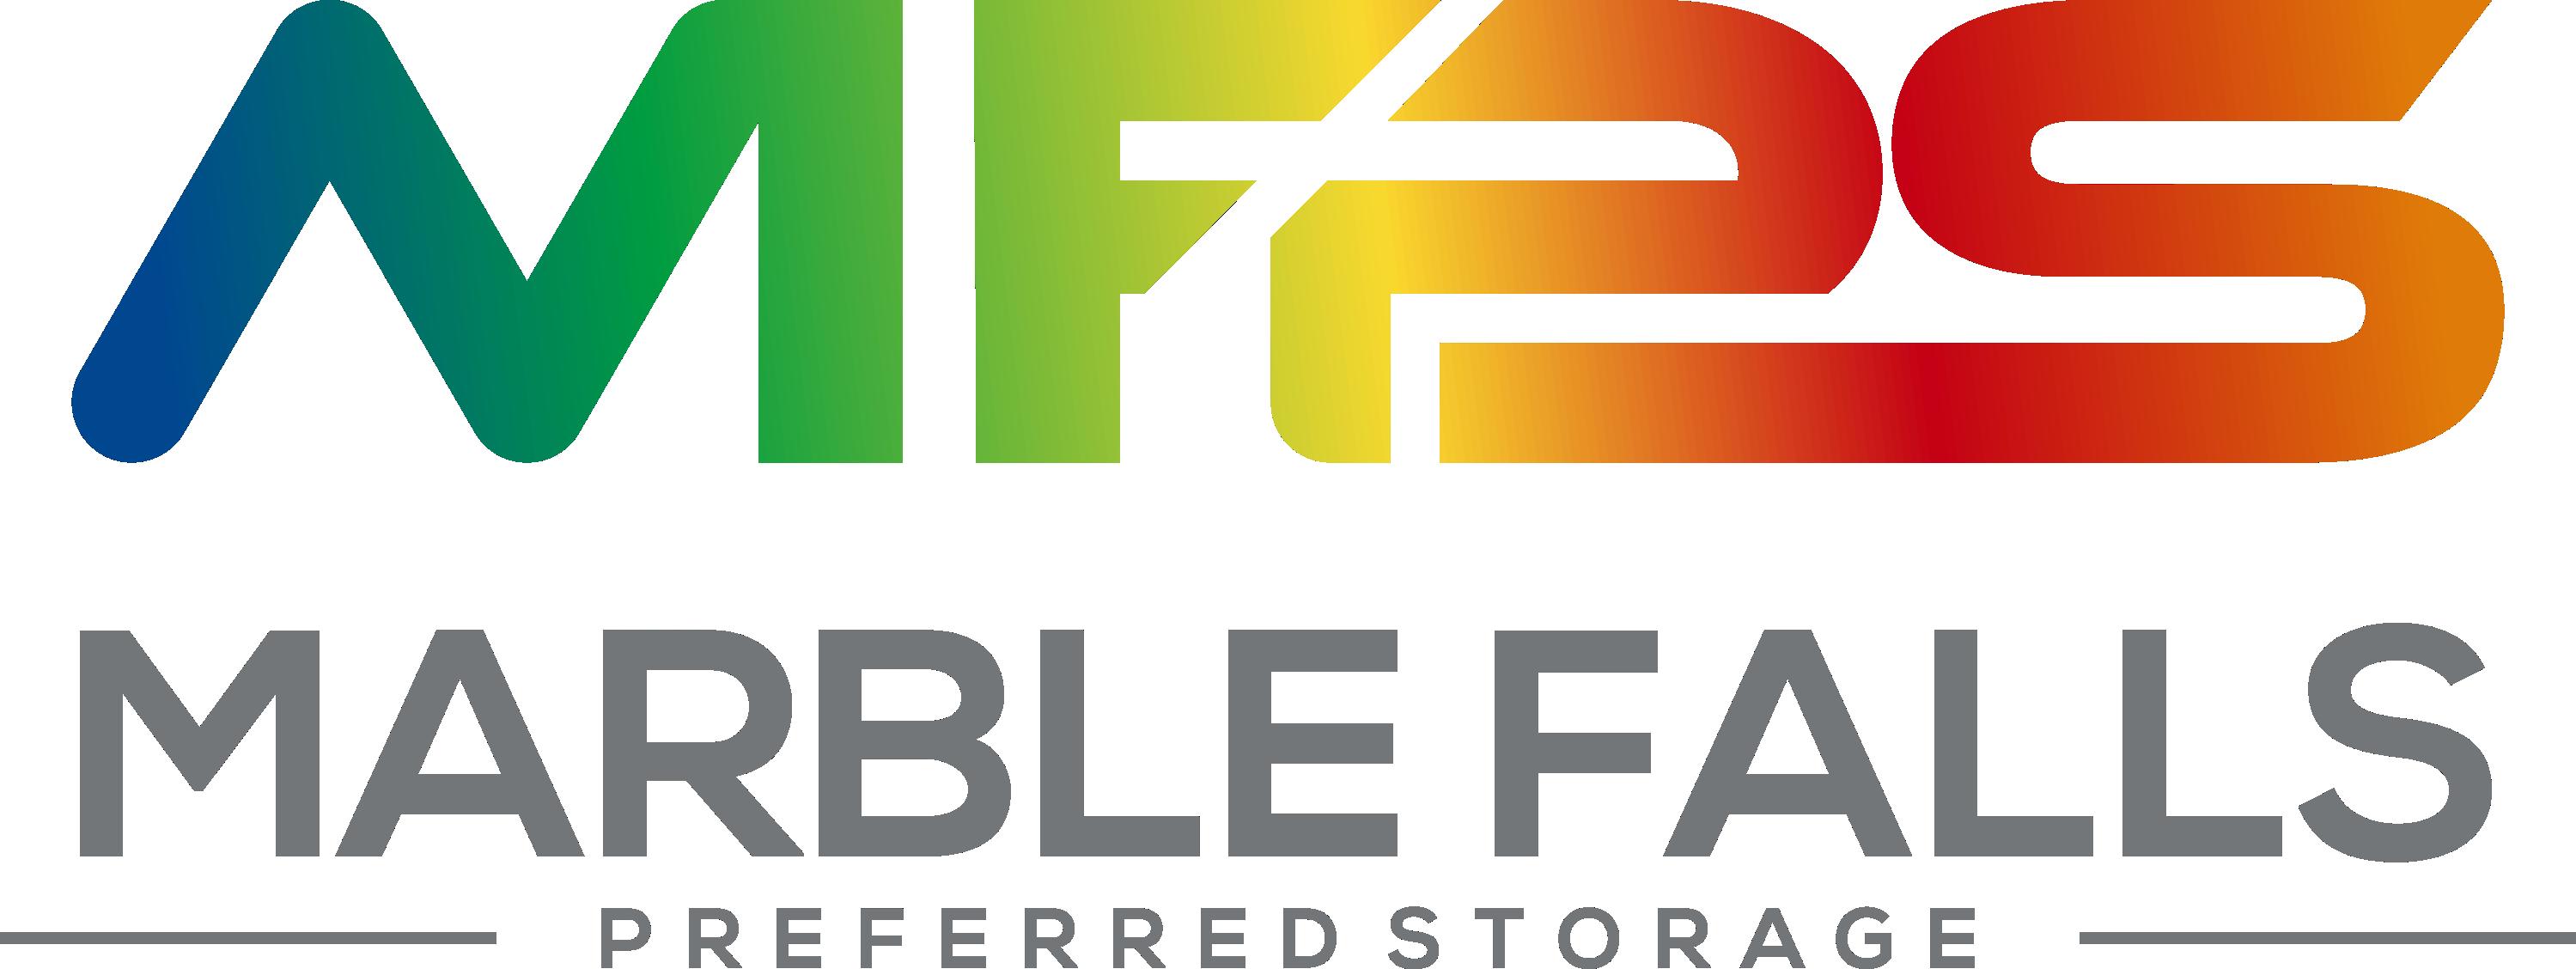 Marble Falls Preferred storage